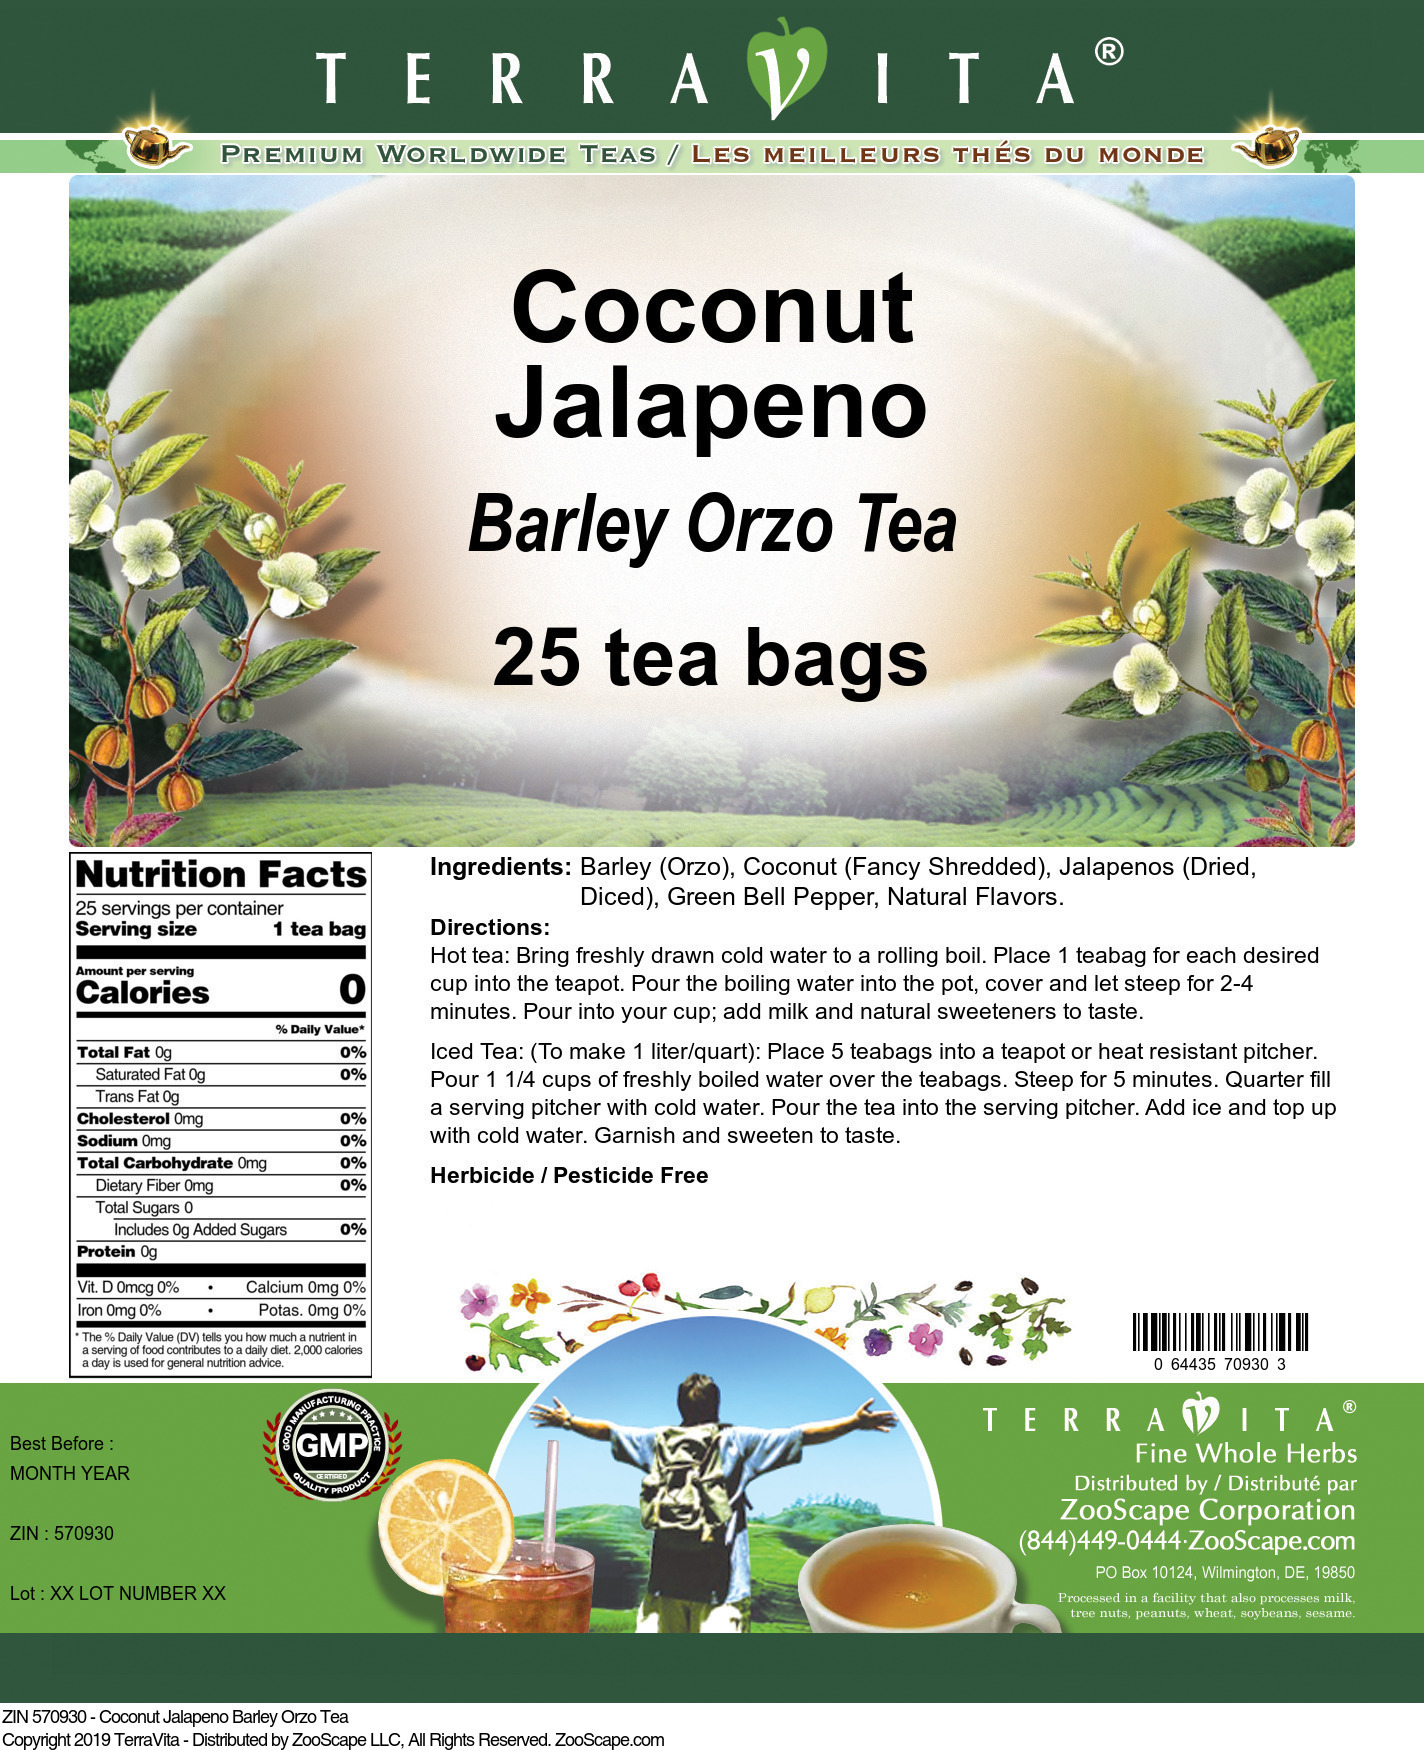 Coconut Jalapeno Barley Orzo